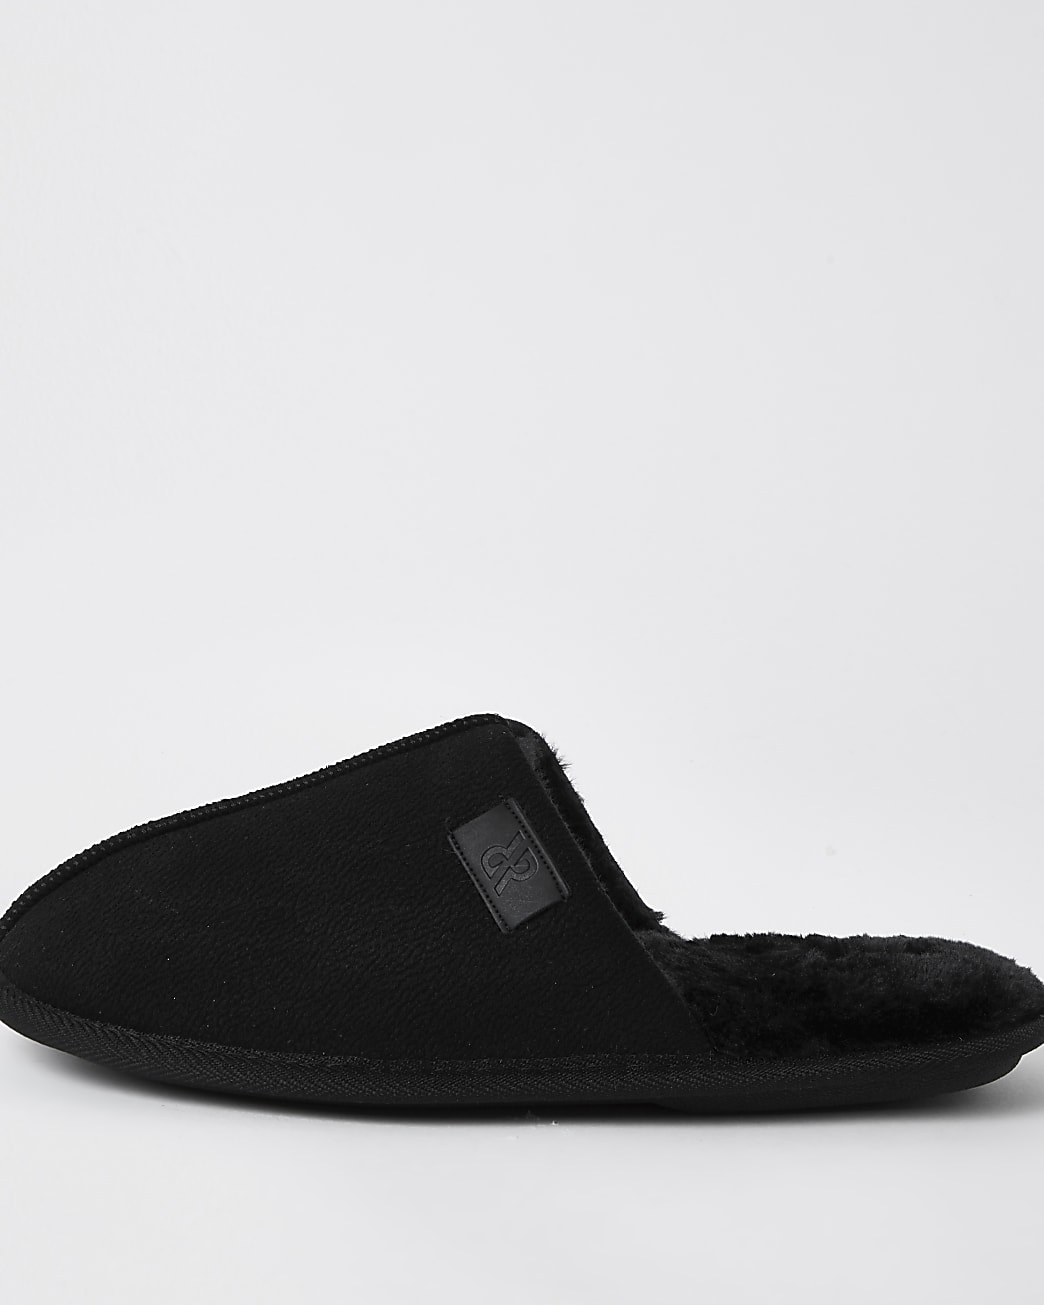 Black suedette mule slippers